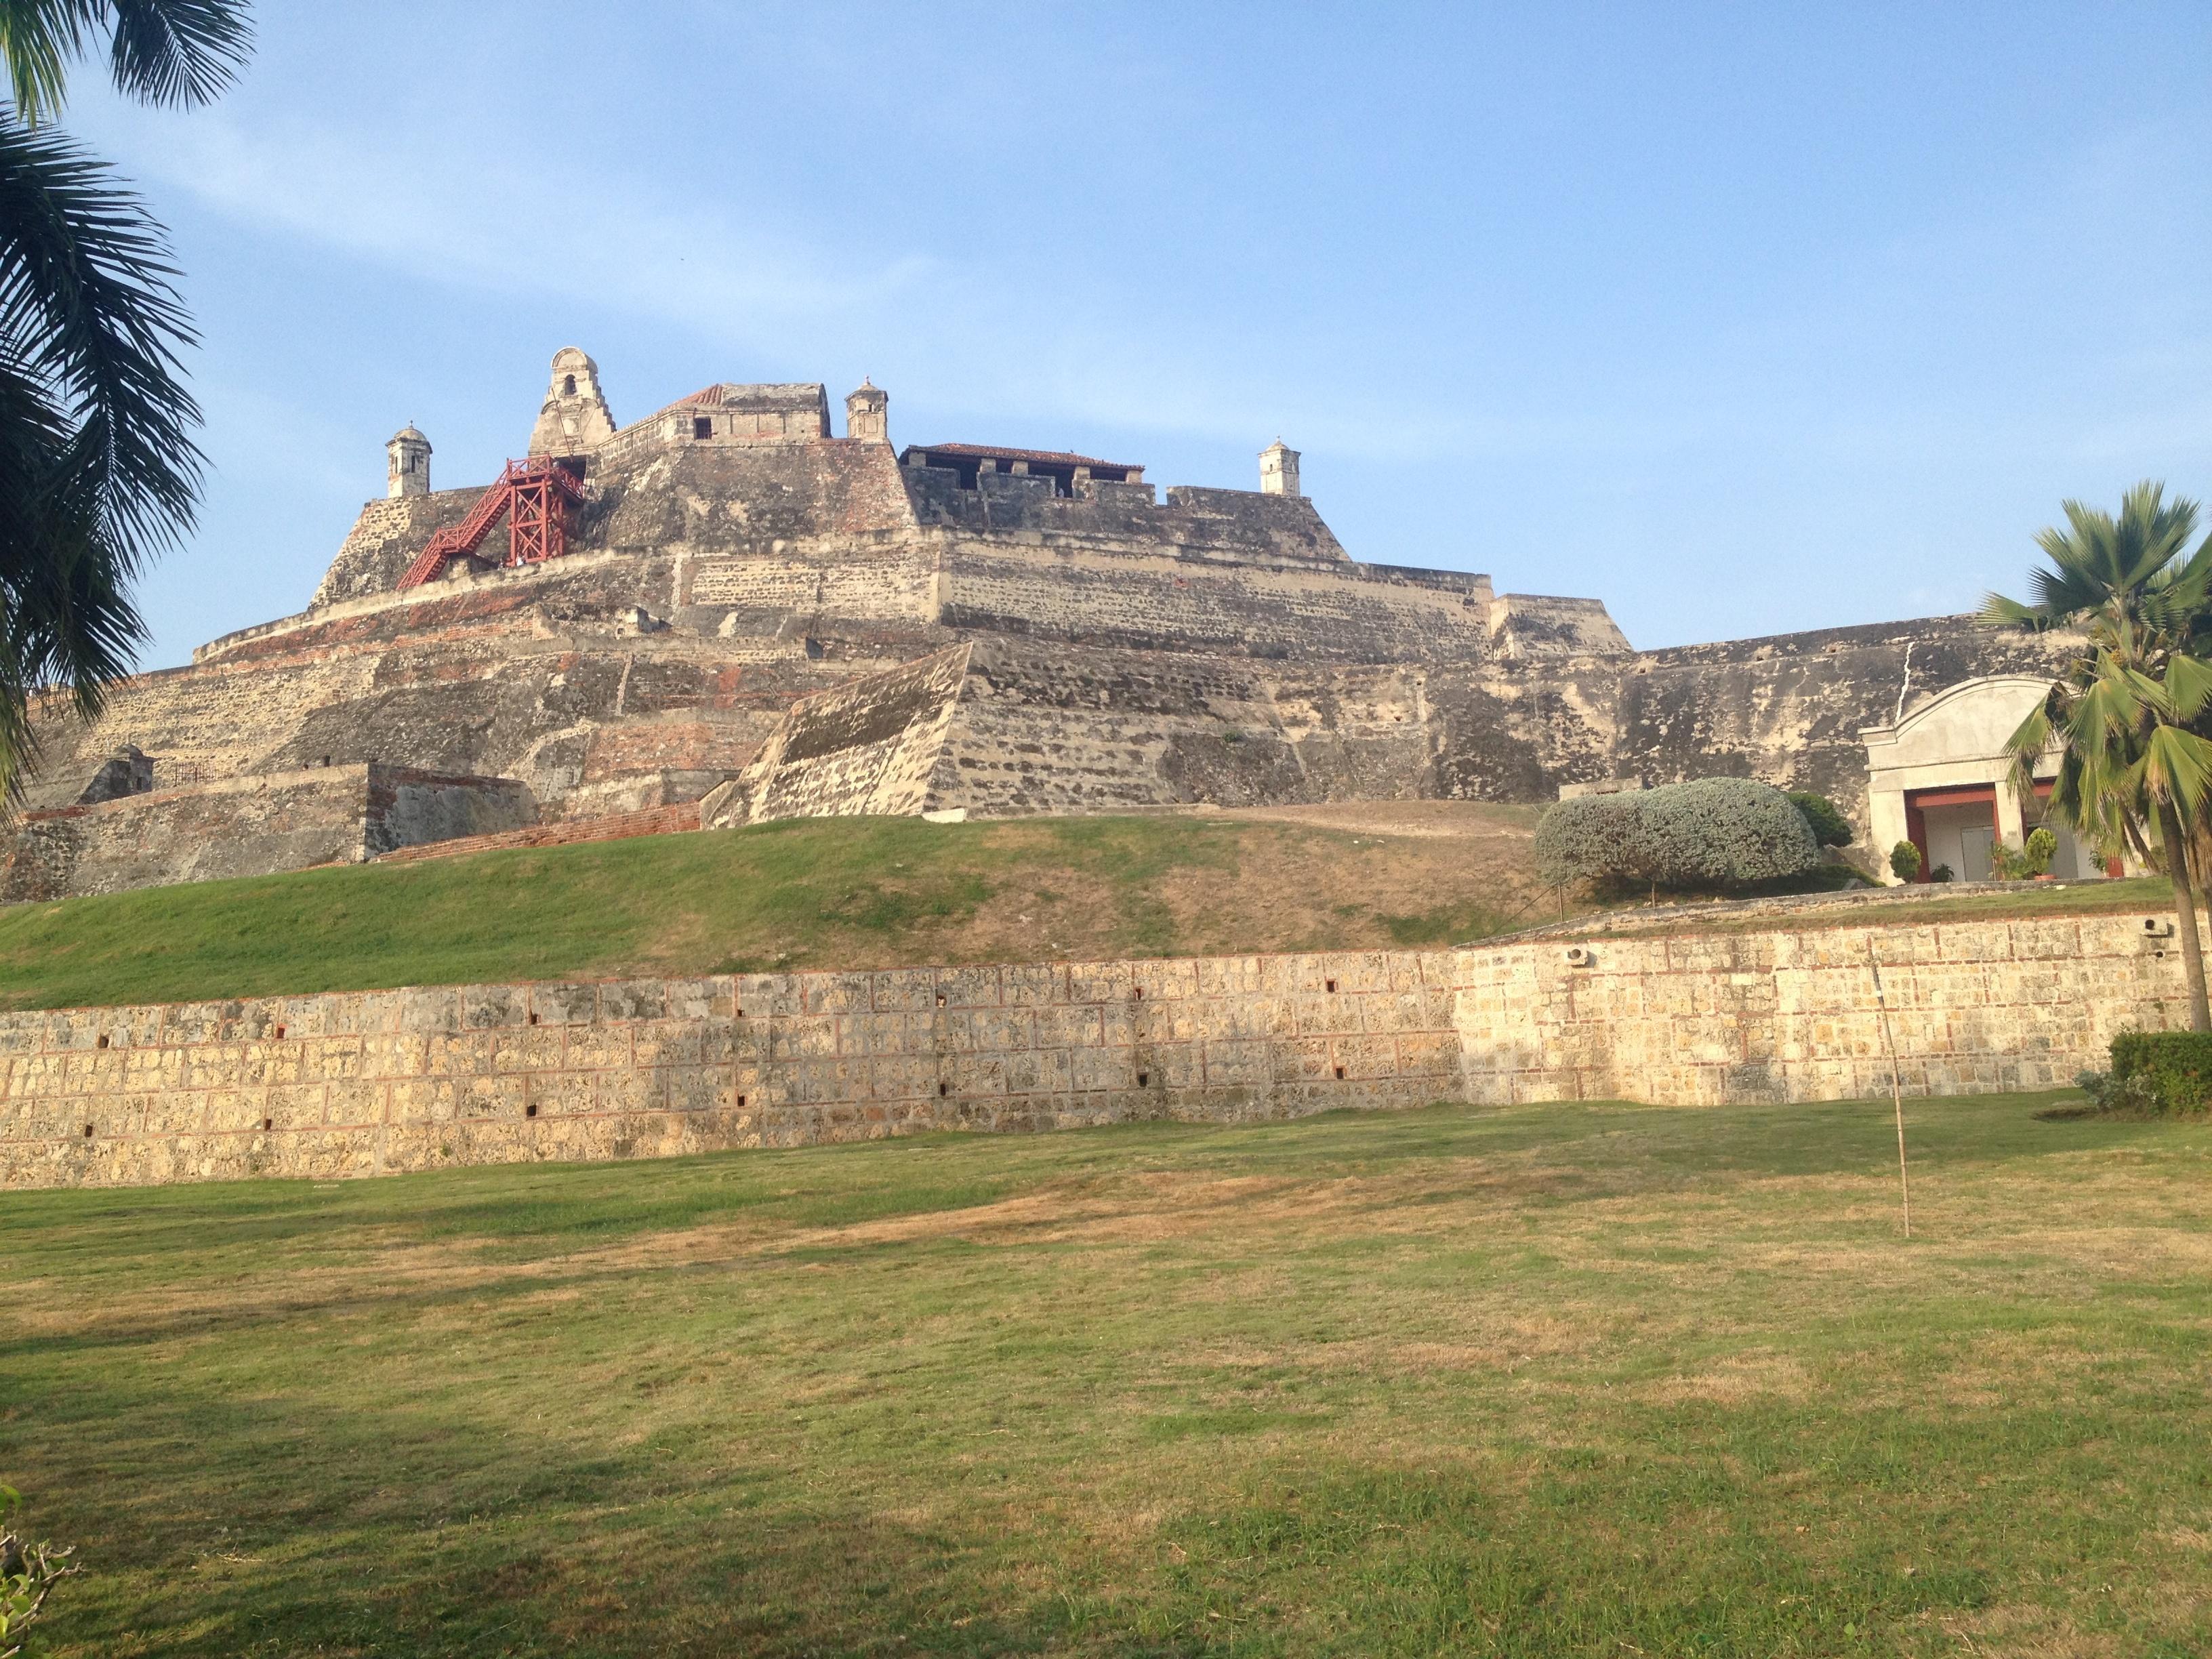 Castillo San felpe de Barajas